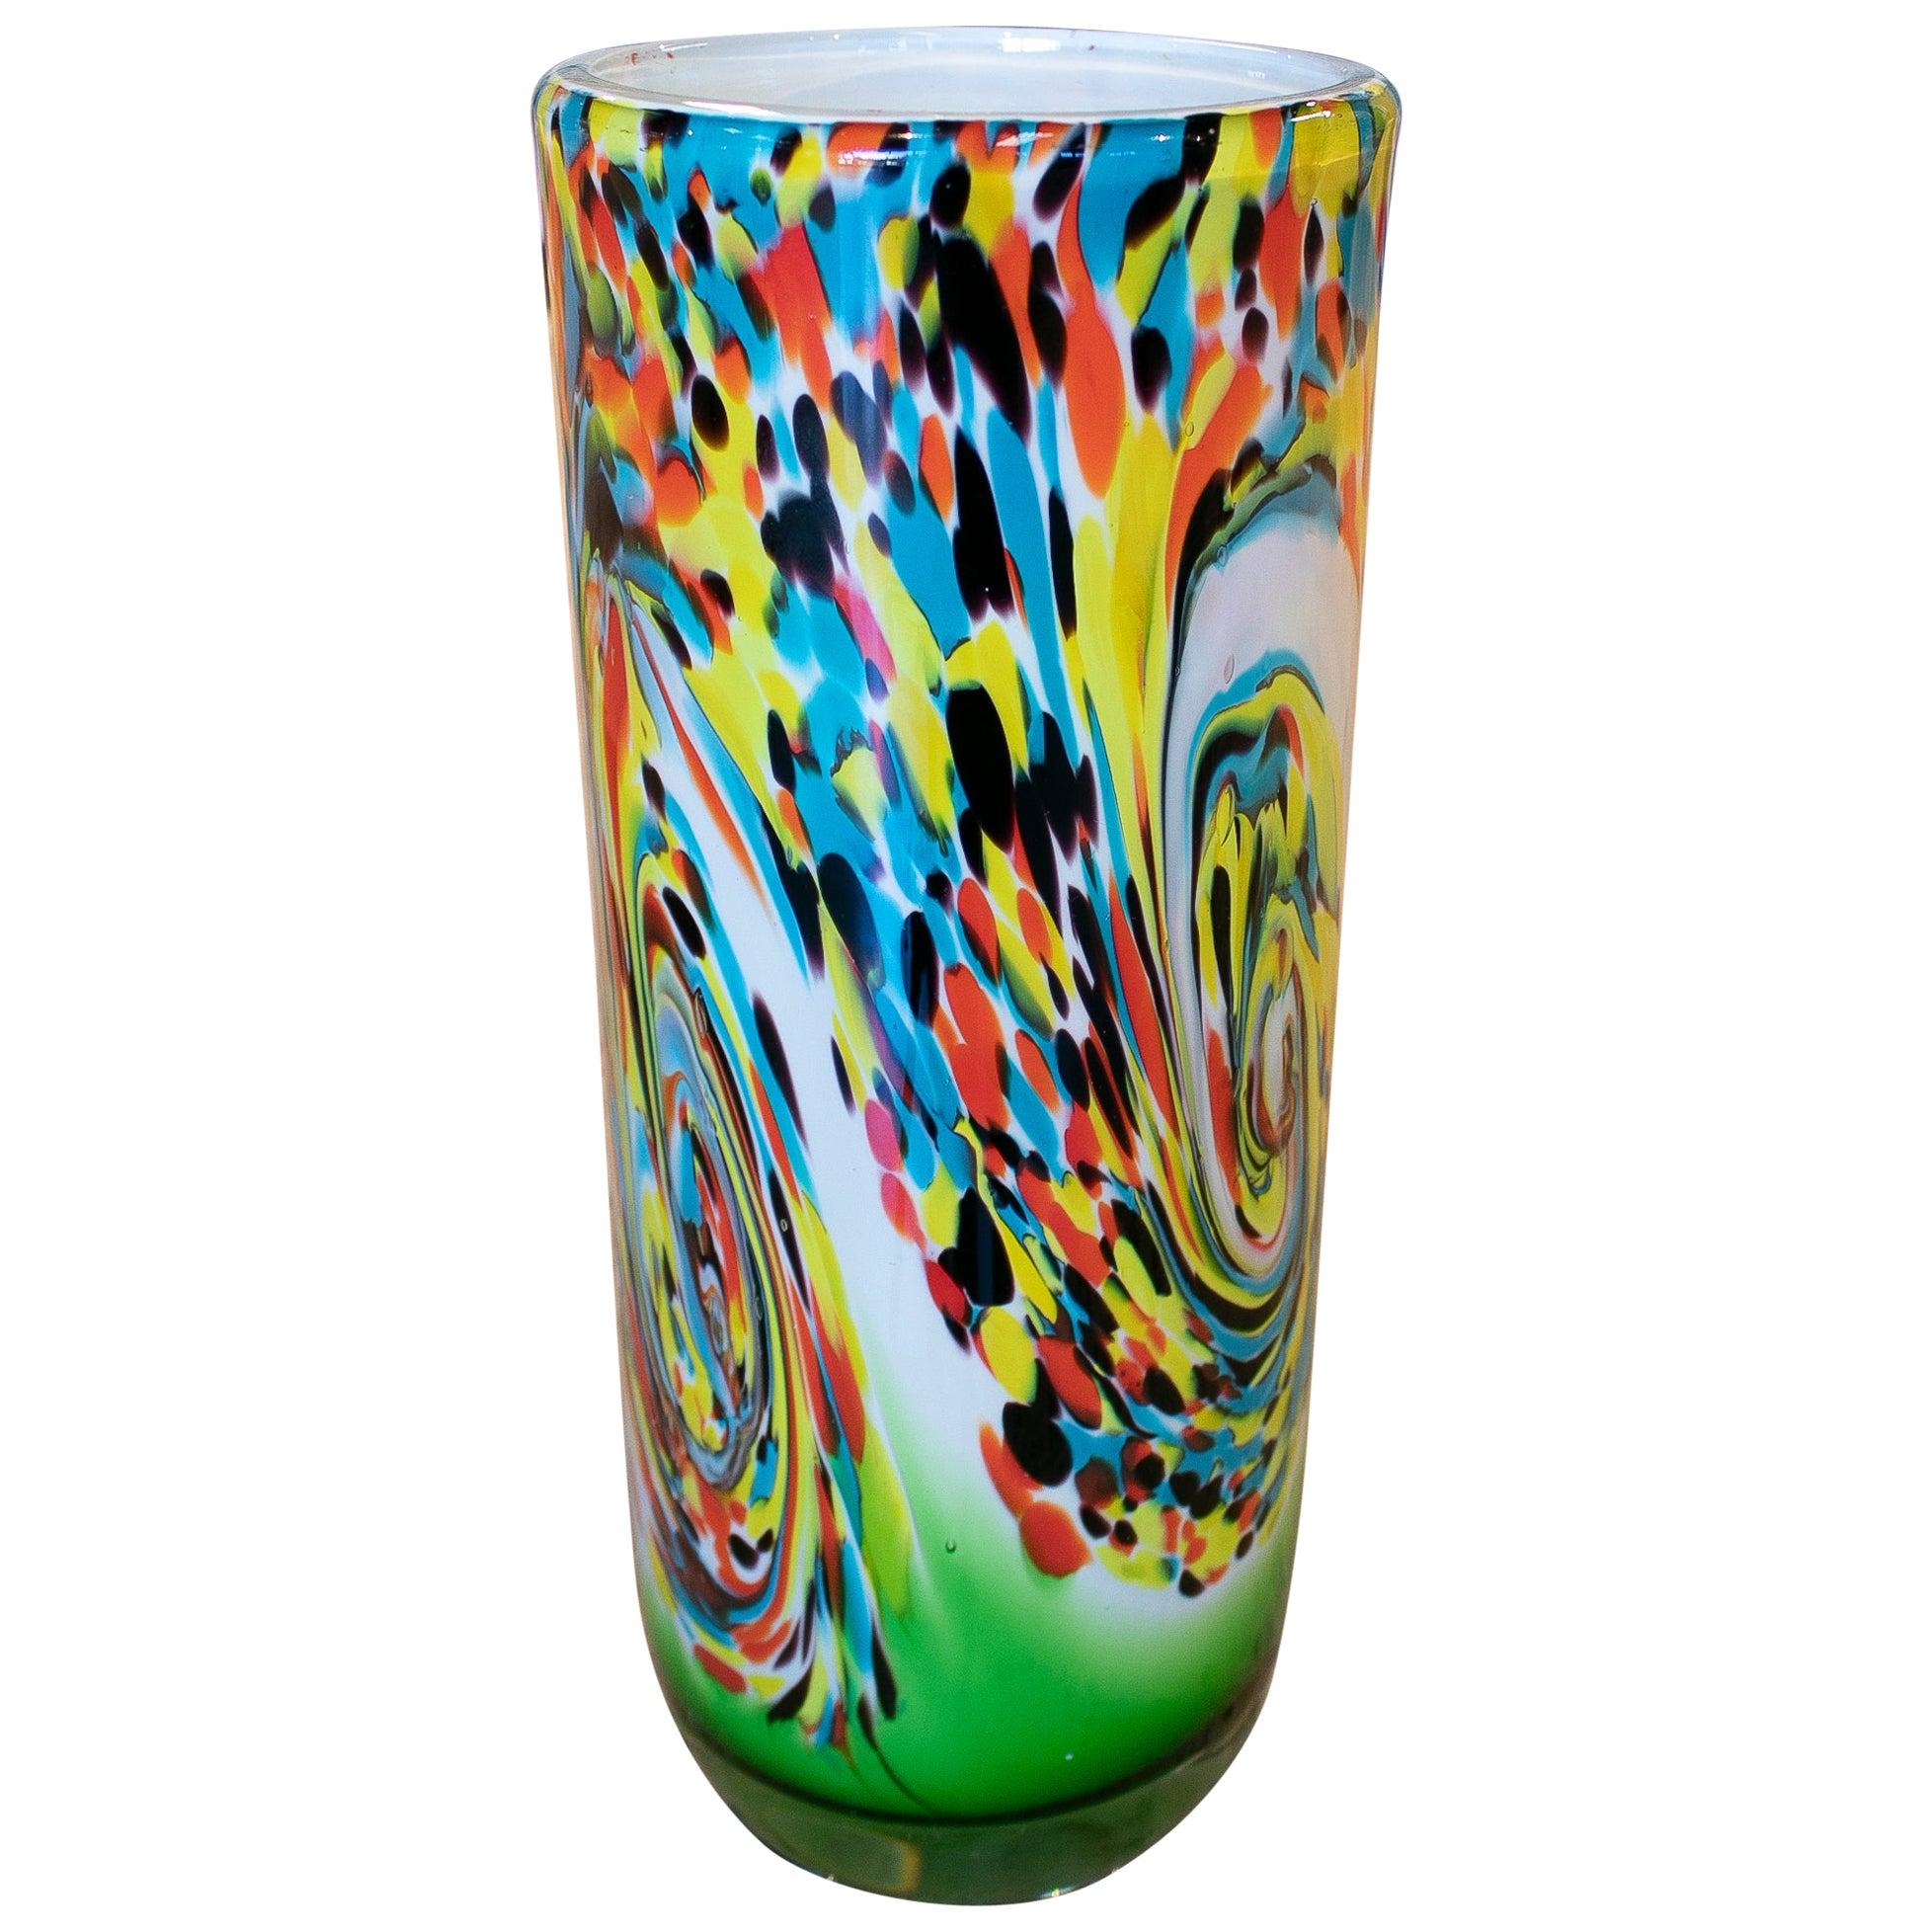 1980s Italian Venetian Murano Glass Colorful Vase